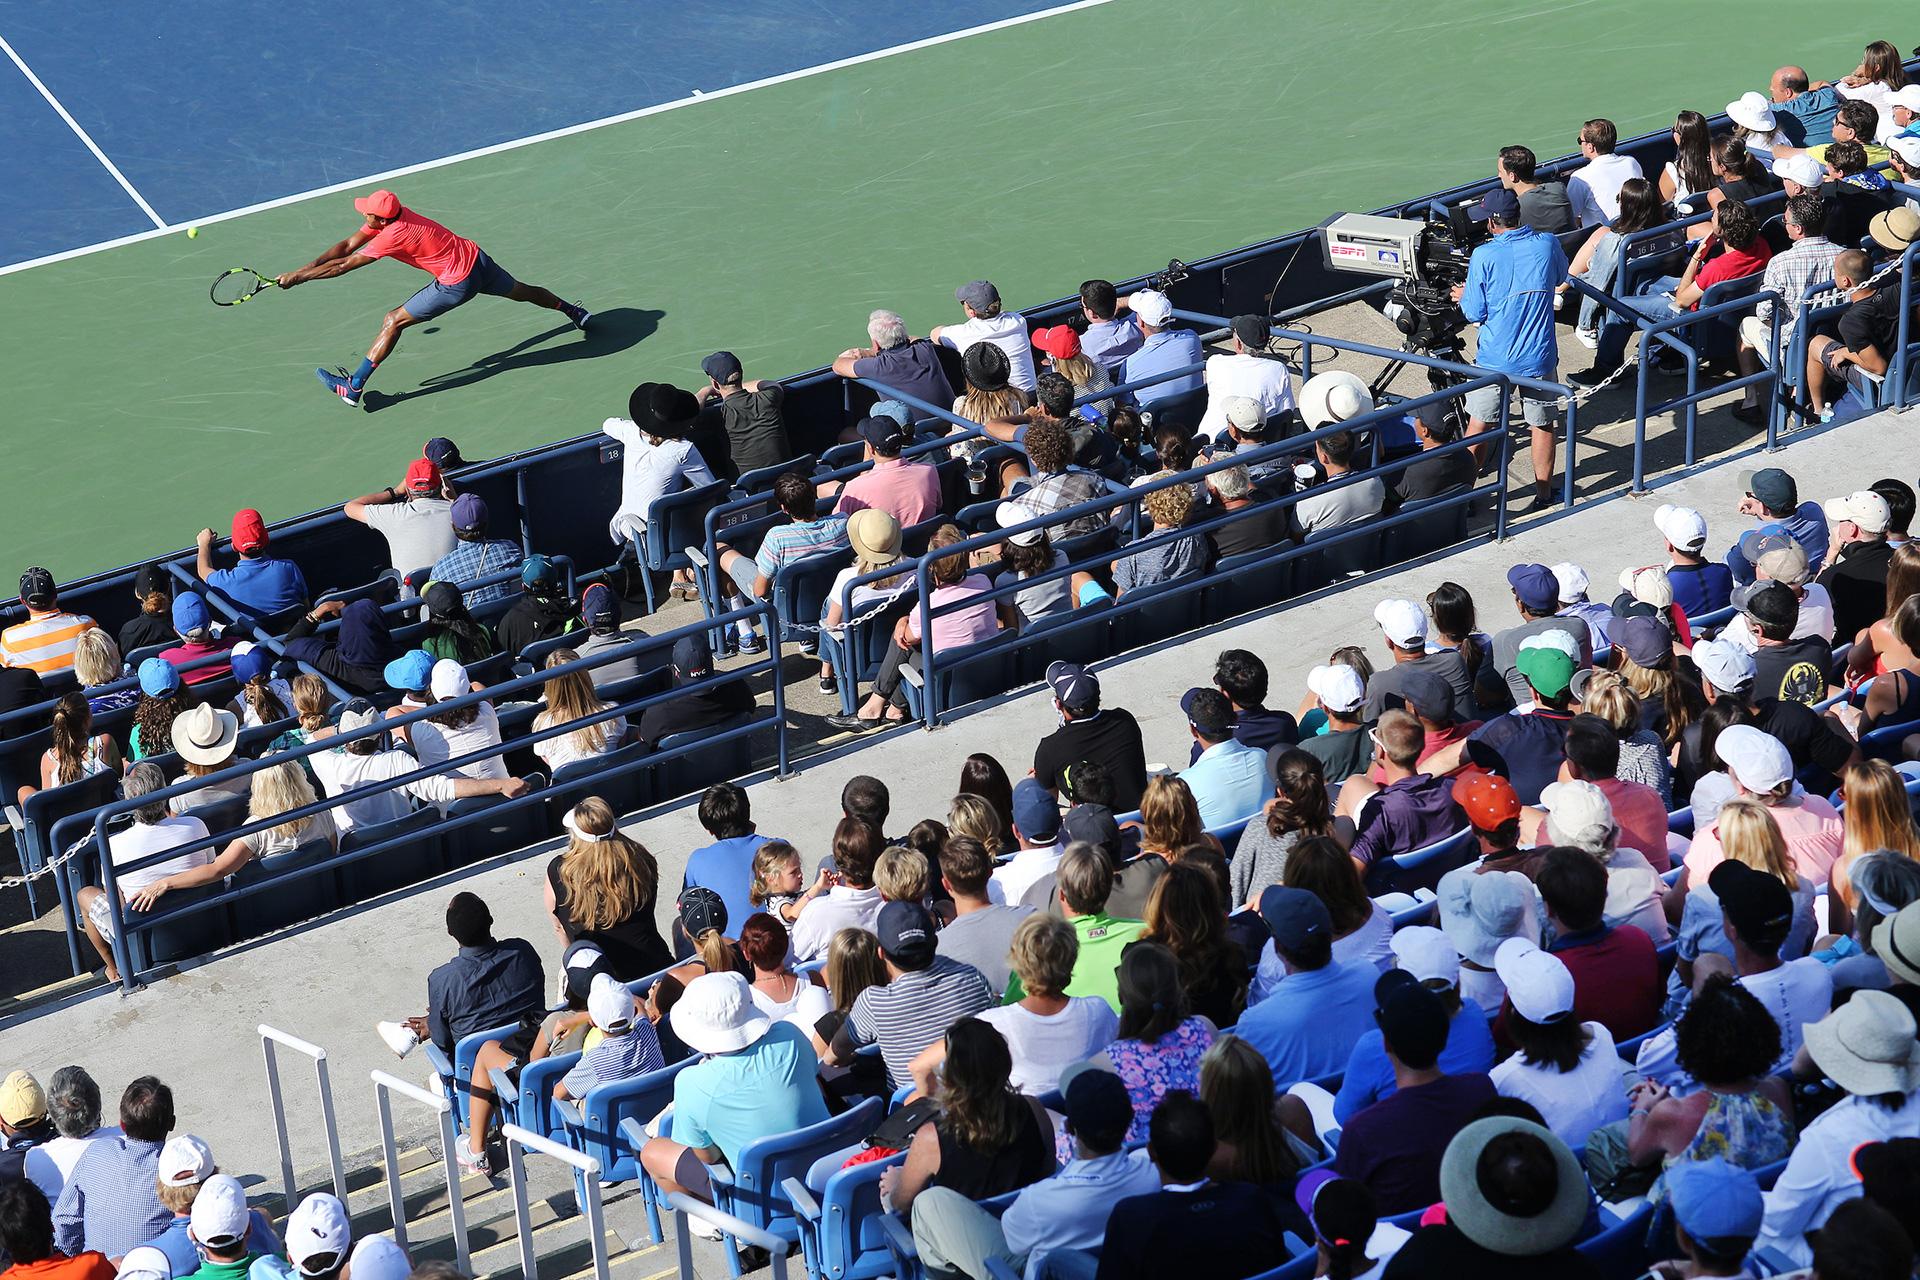 040916_Tennis_USOpen_3943